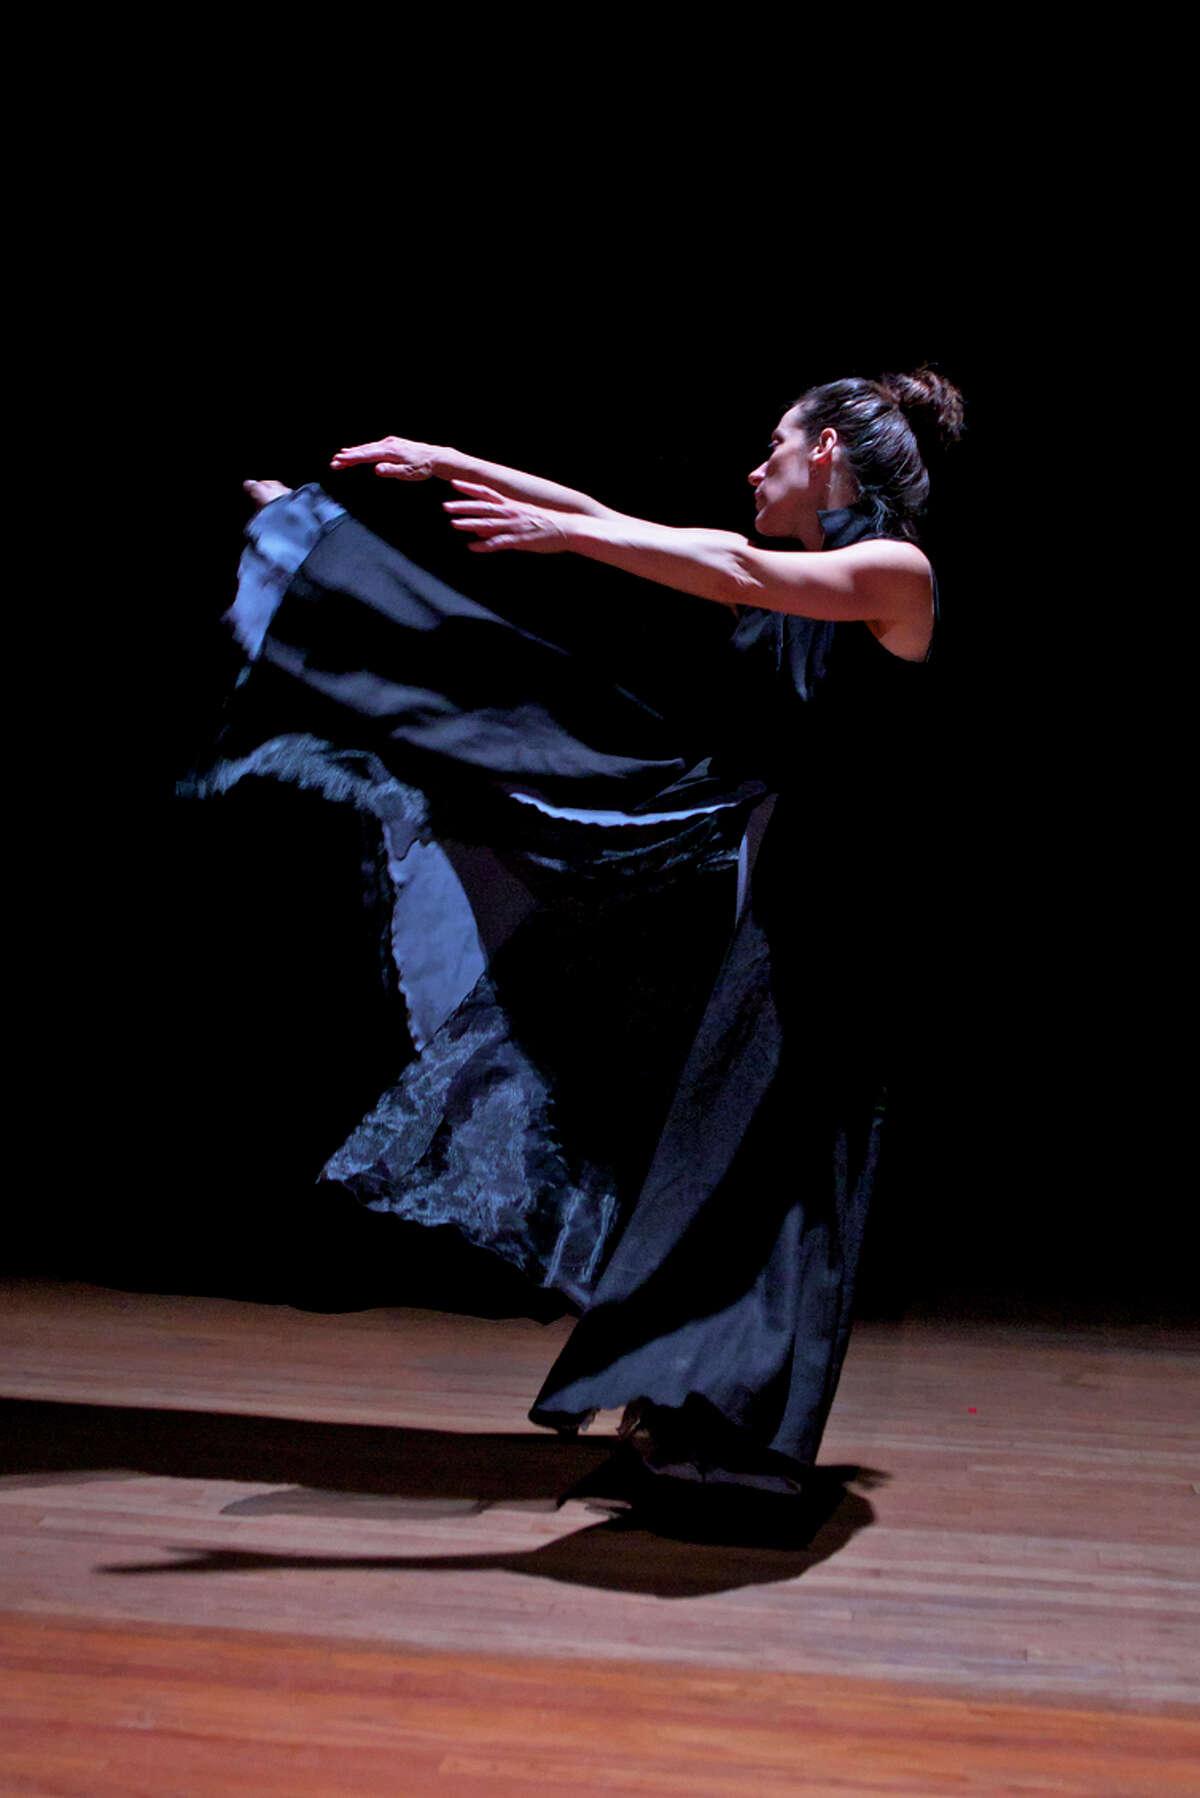 Solo dancer Randee Paufve won an Isadora Duncan Dance Award for individual performance.